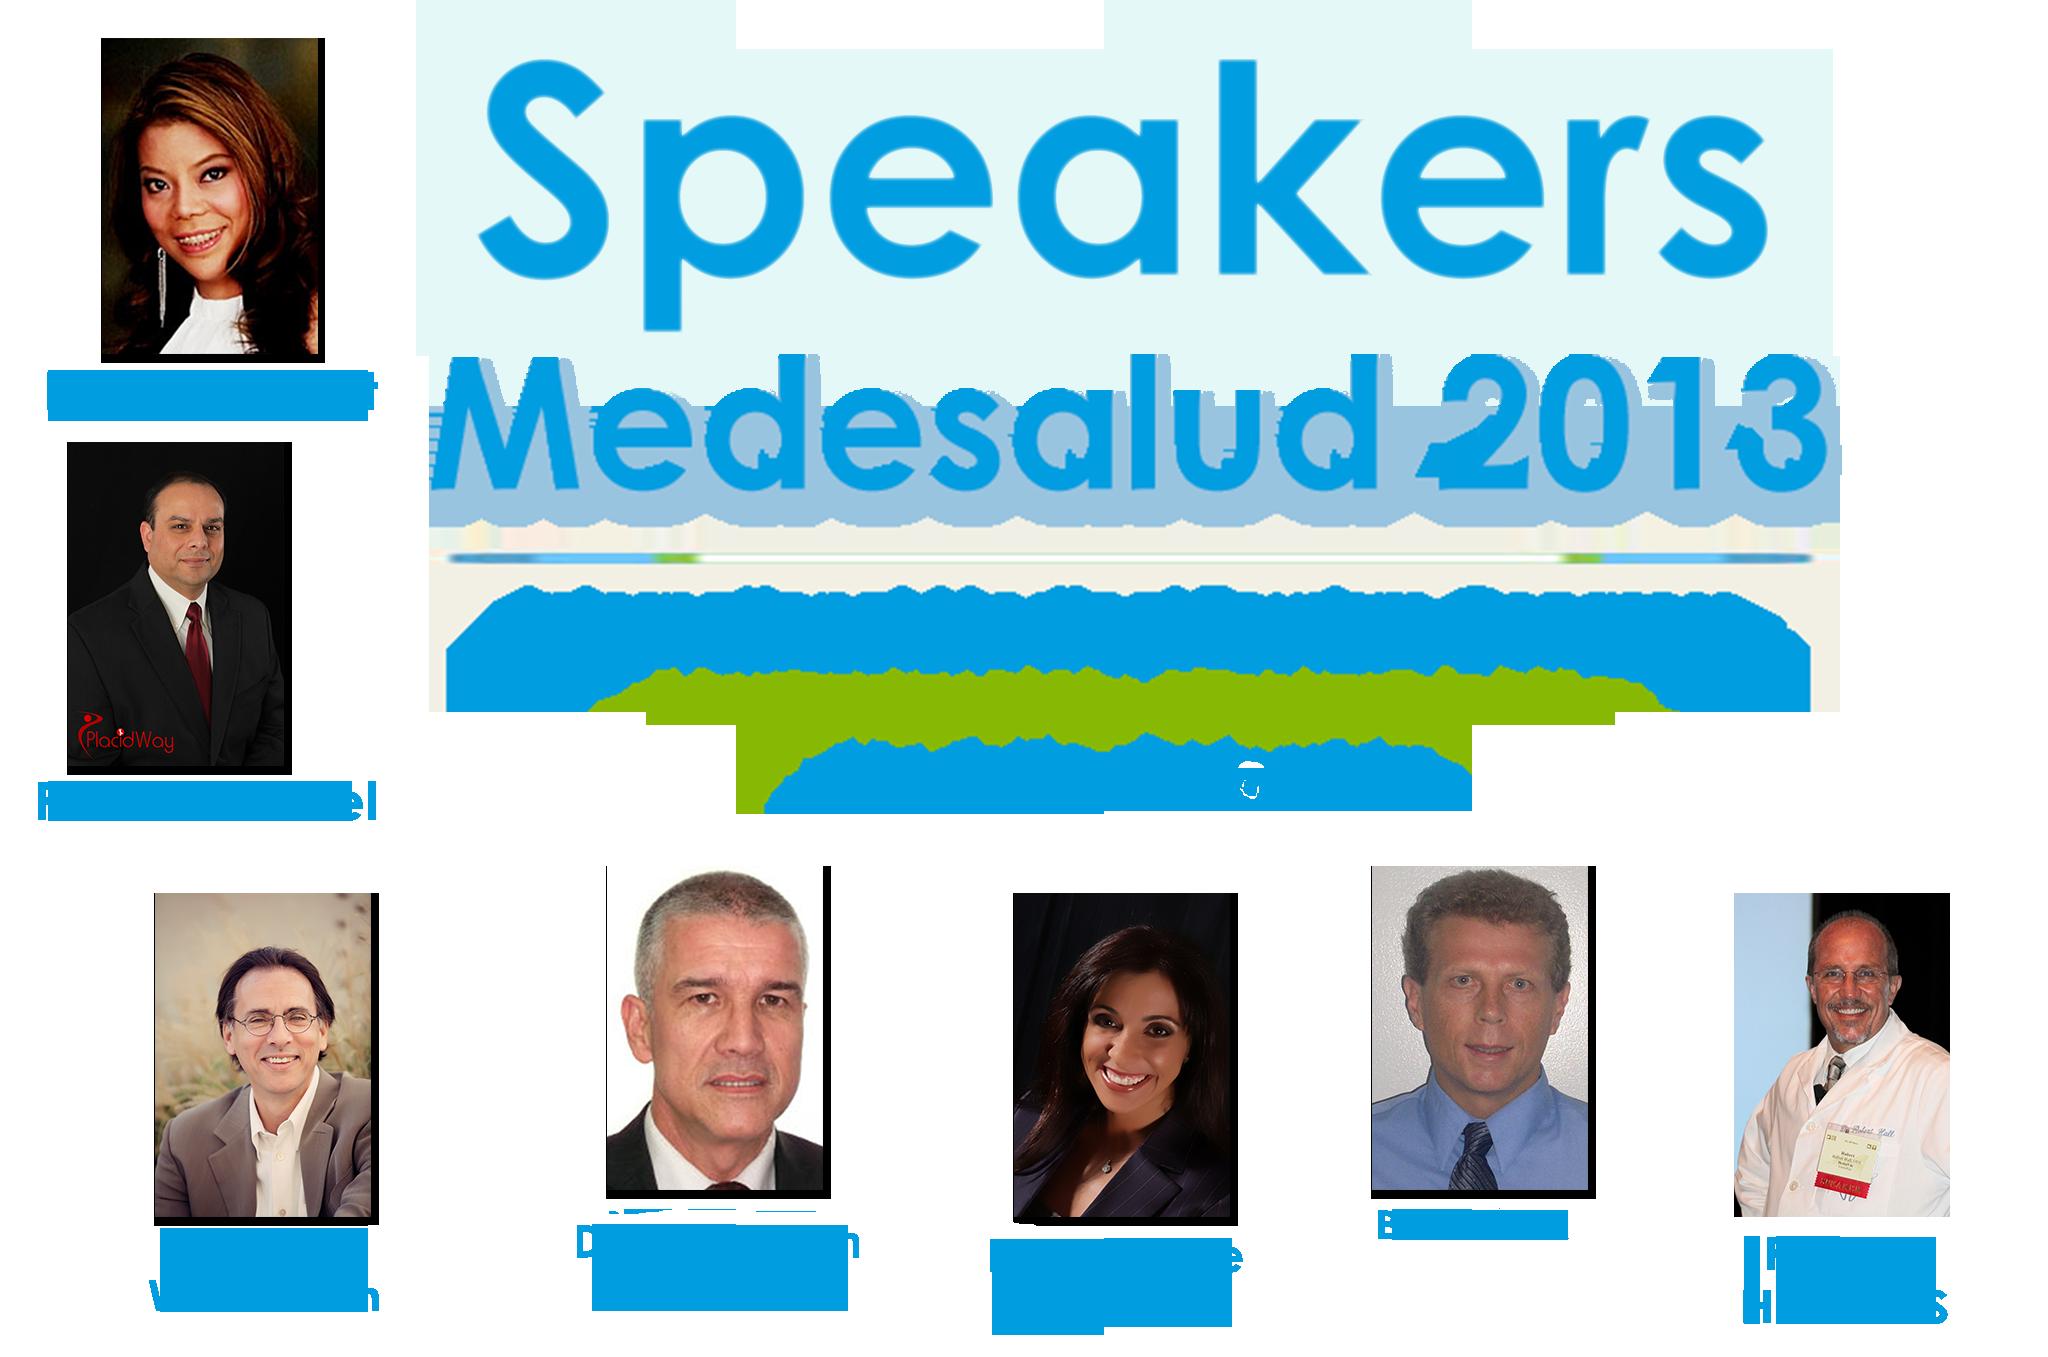 Medical-Tourism-Experts-2013-Medesalud-PlacidWay